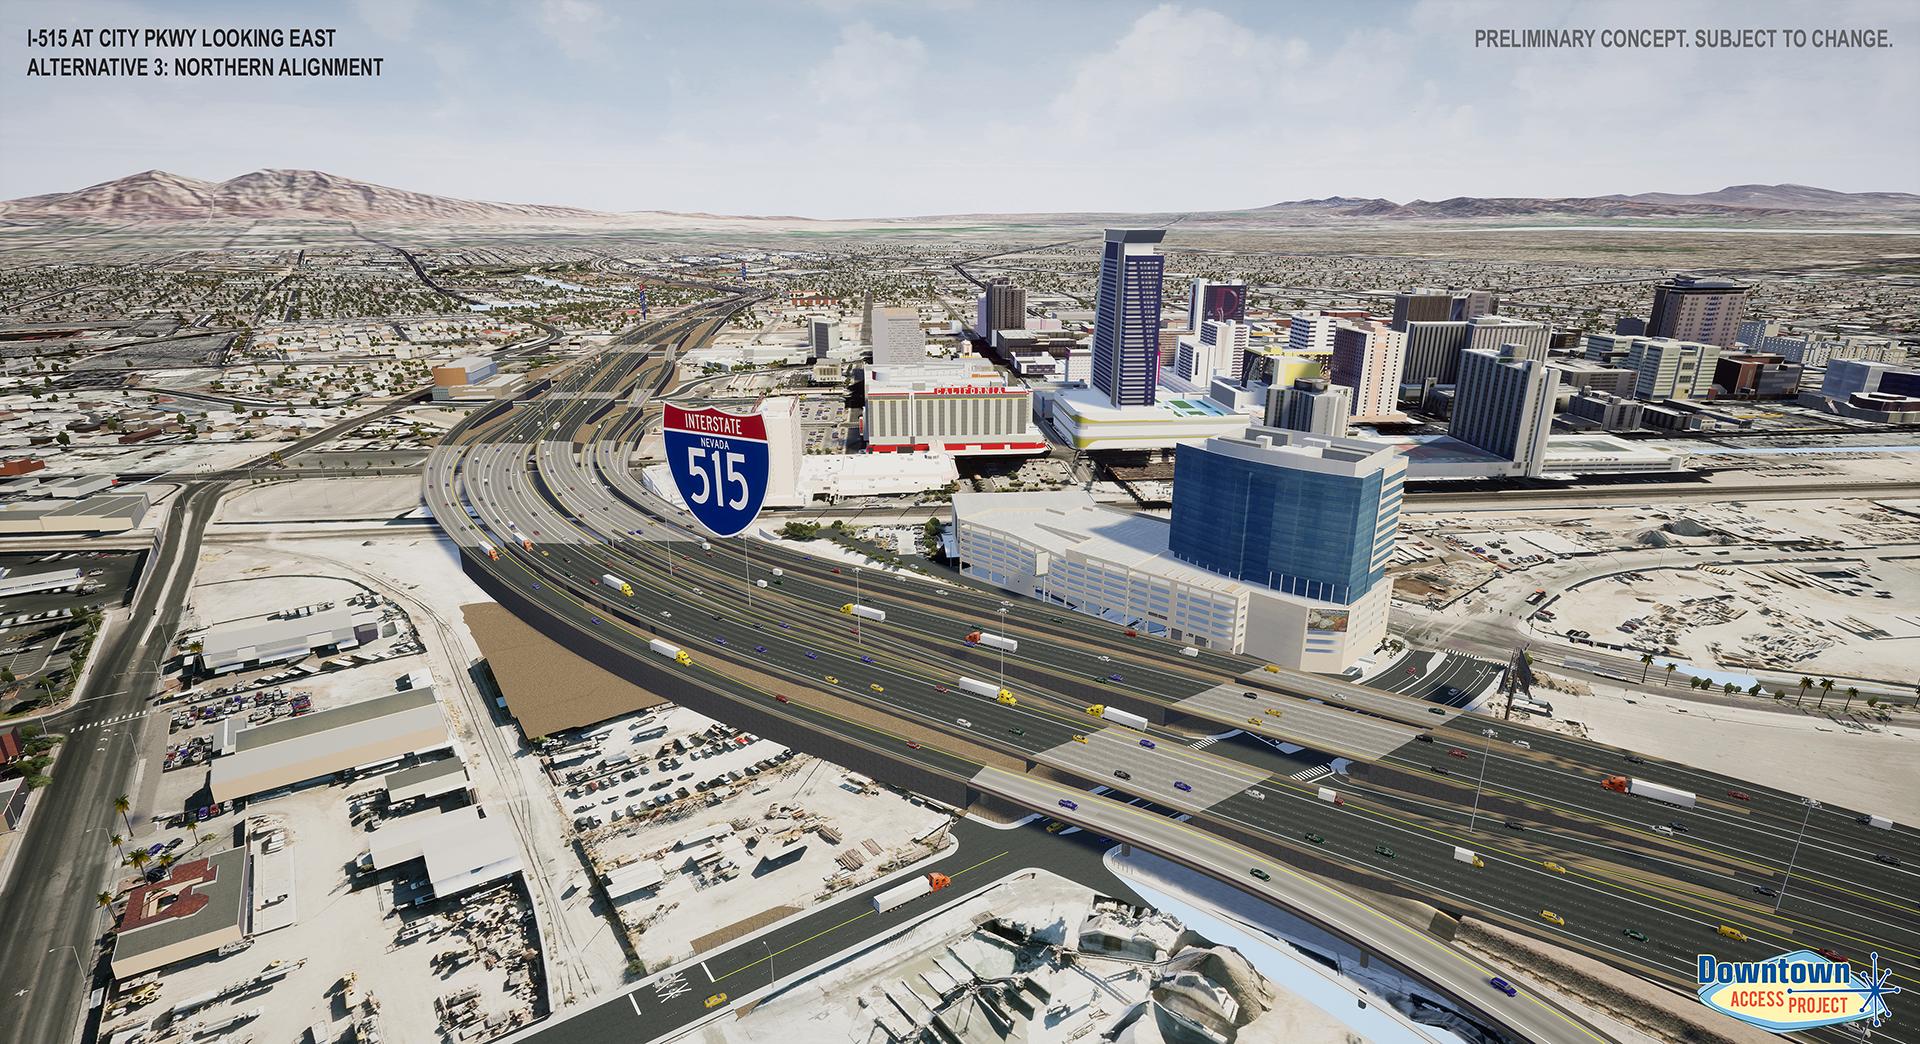 I-515 near city parkway alternative 3 rendering